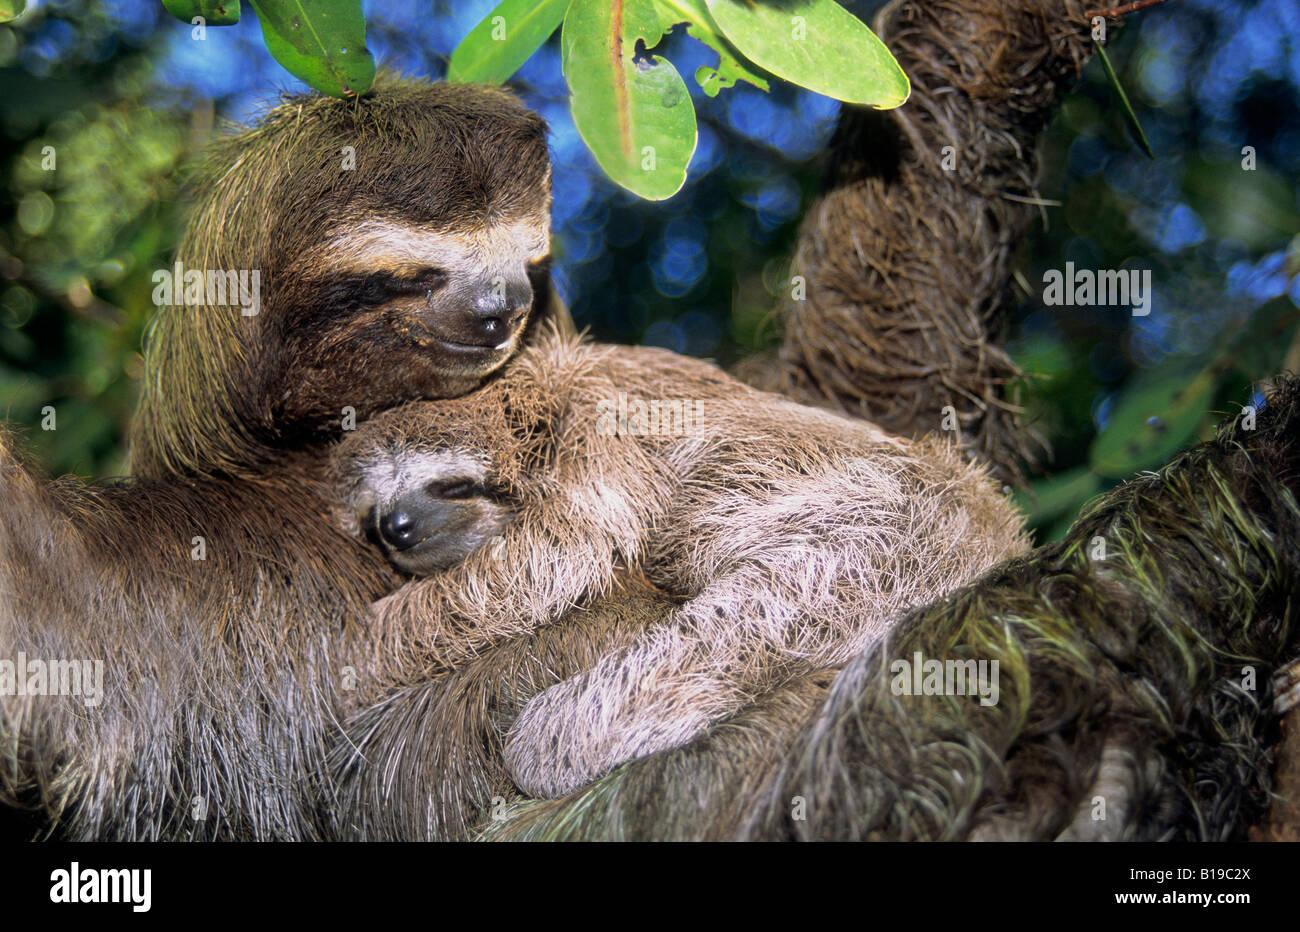 Mother three-toed sloth (Bradypus variegatus) and young, coastal mangroves, Panama, Central America. Stock Photo